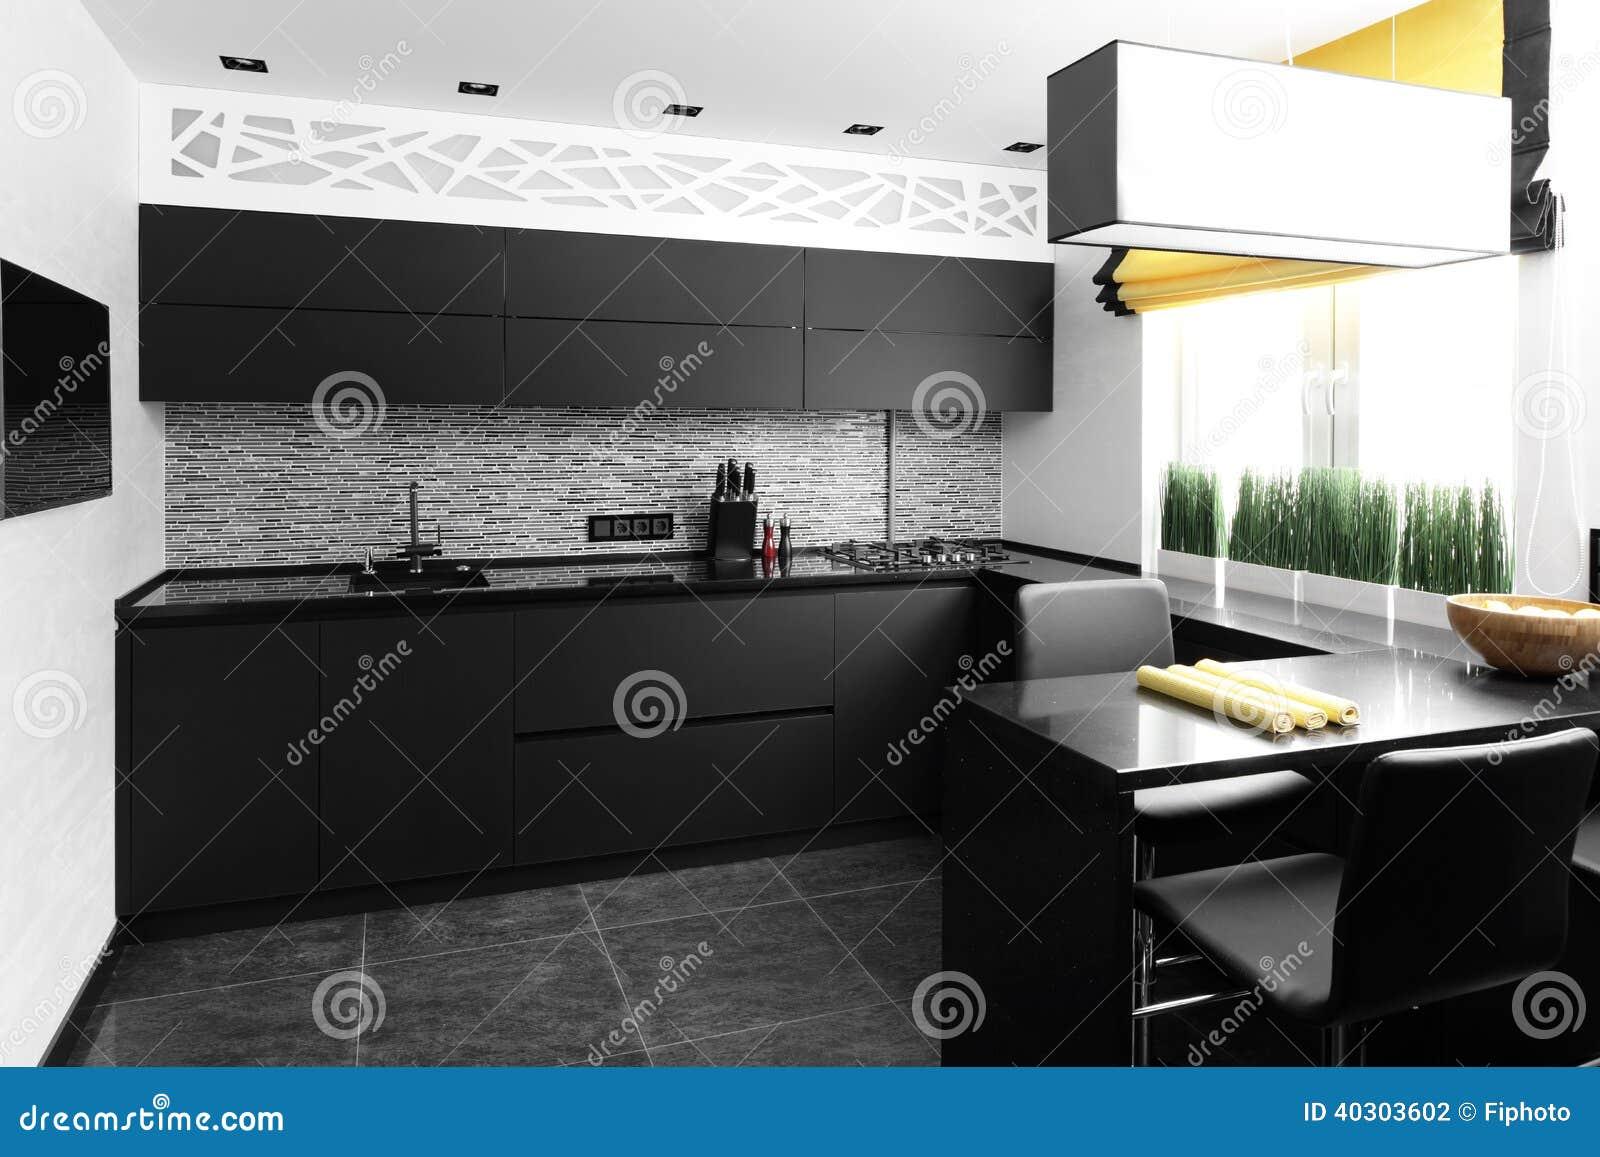 Int rieur de cuisine europ enne moderne - Interieur cuisine moderne ...